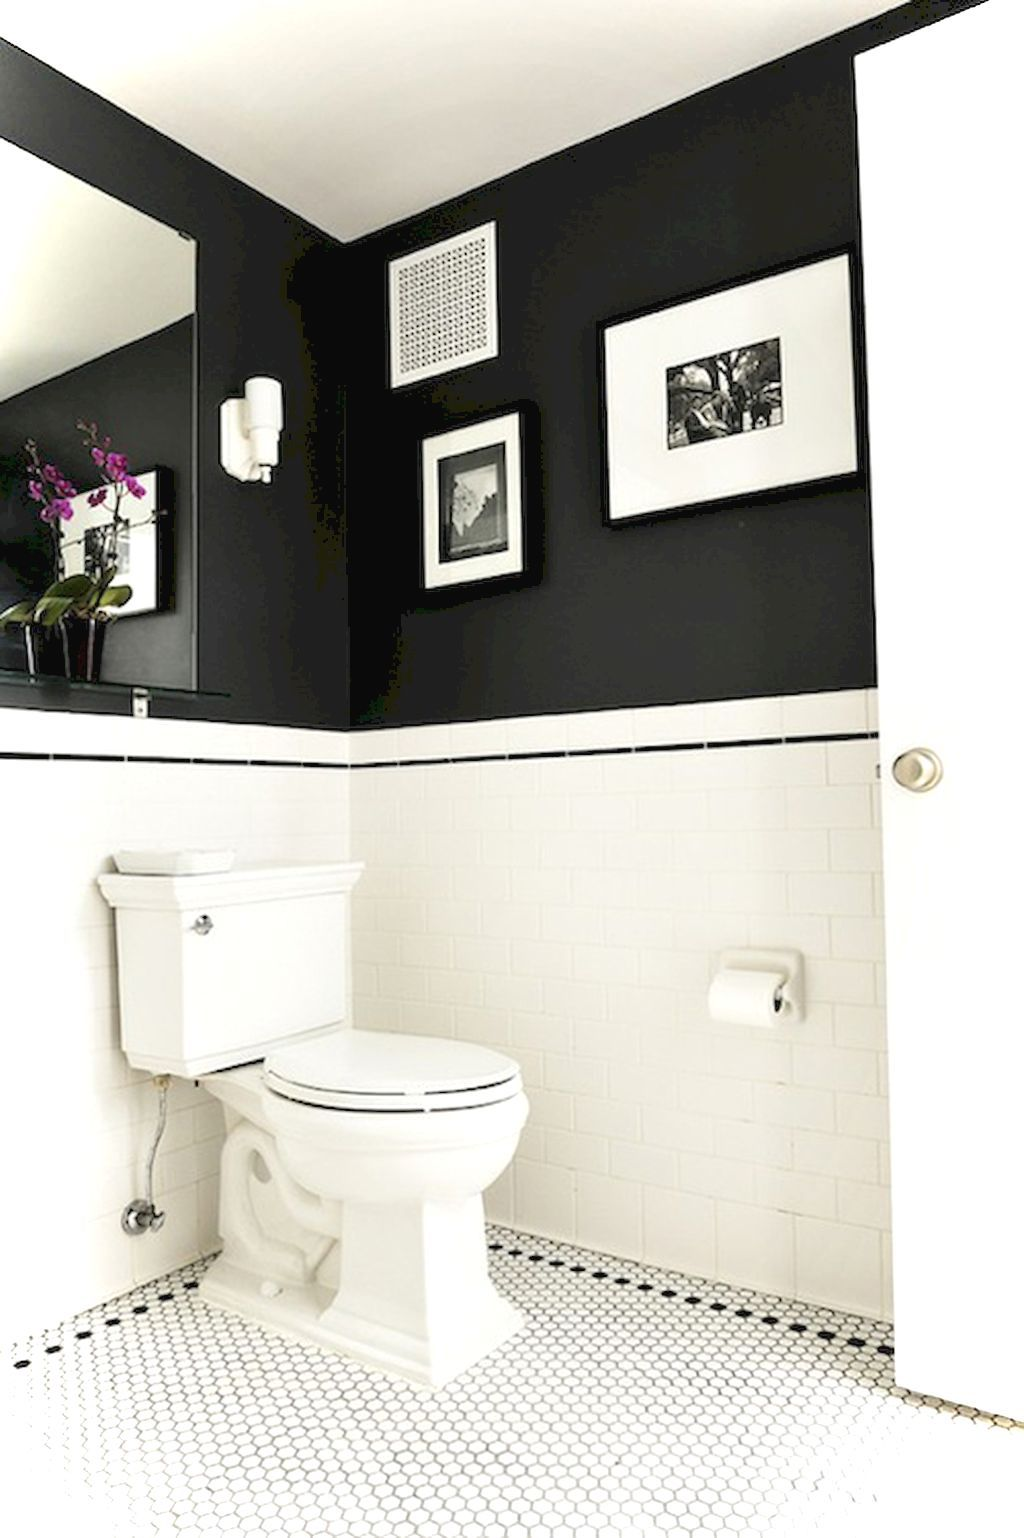 99 luxury black and white bathroom ideas home sweet home white rh pinterest com